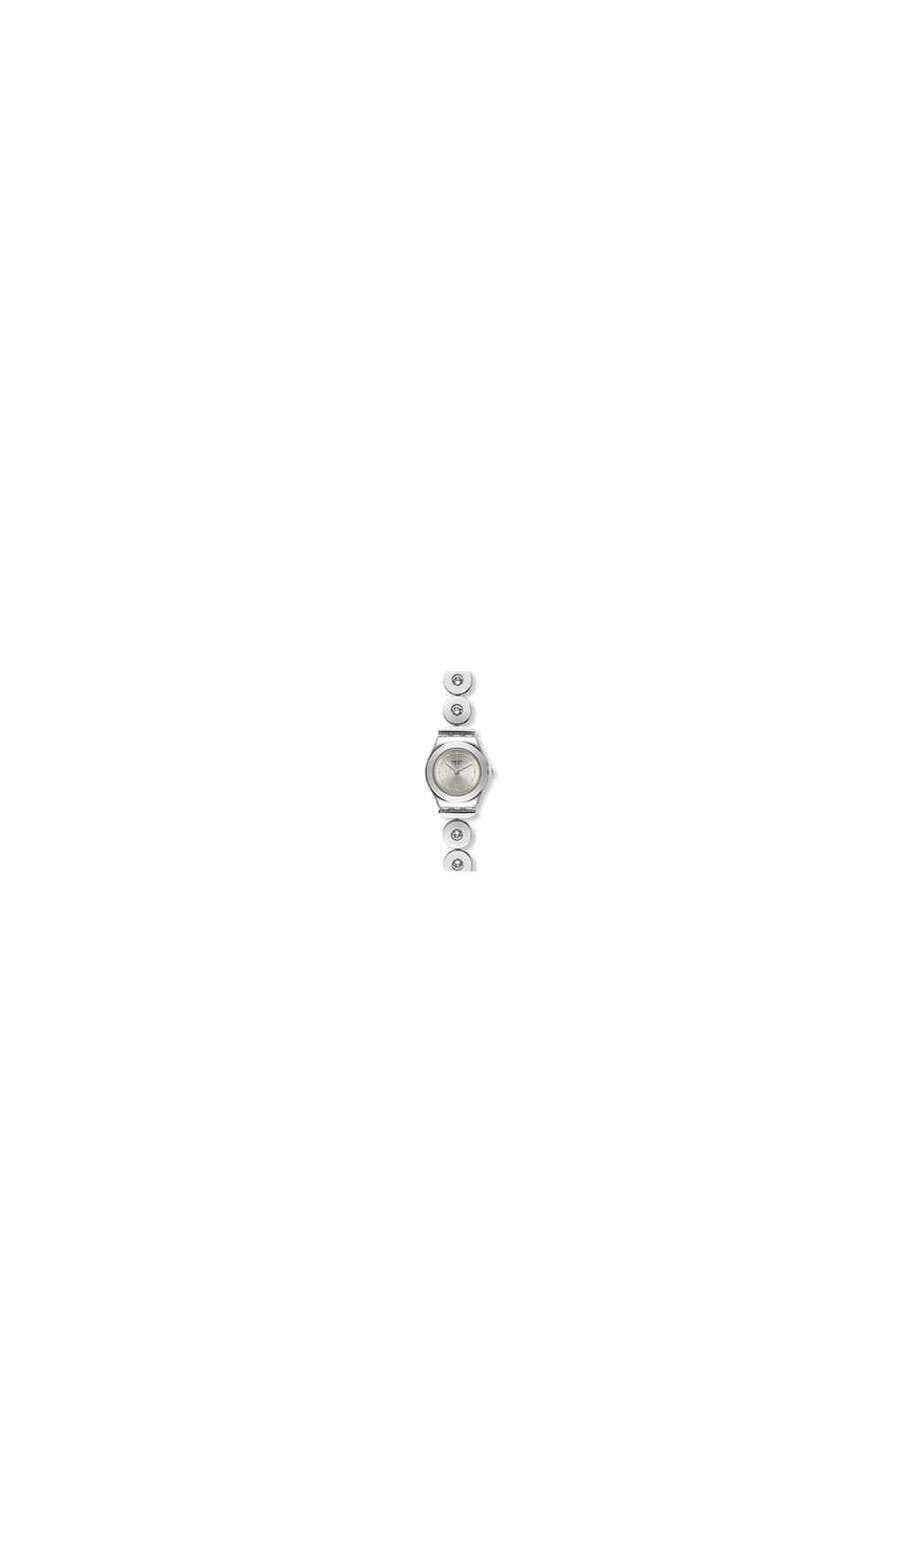 Swatch - INSPIRANCE - 1